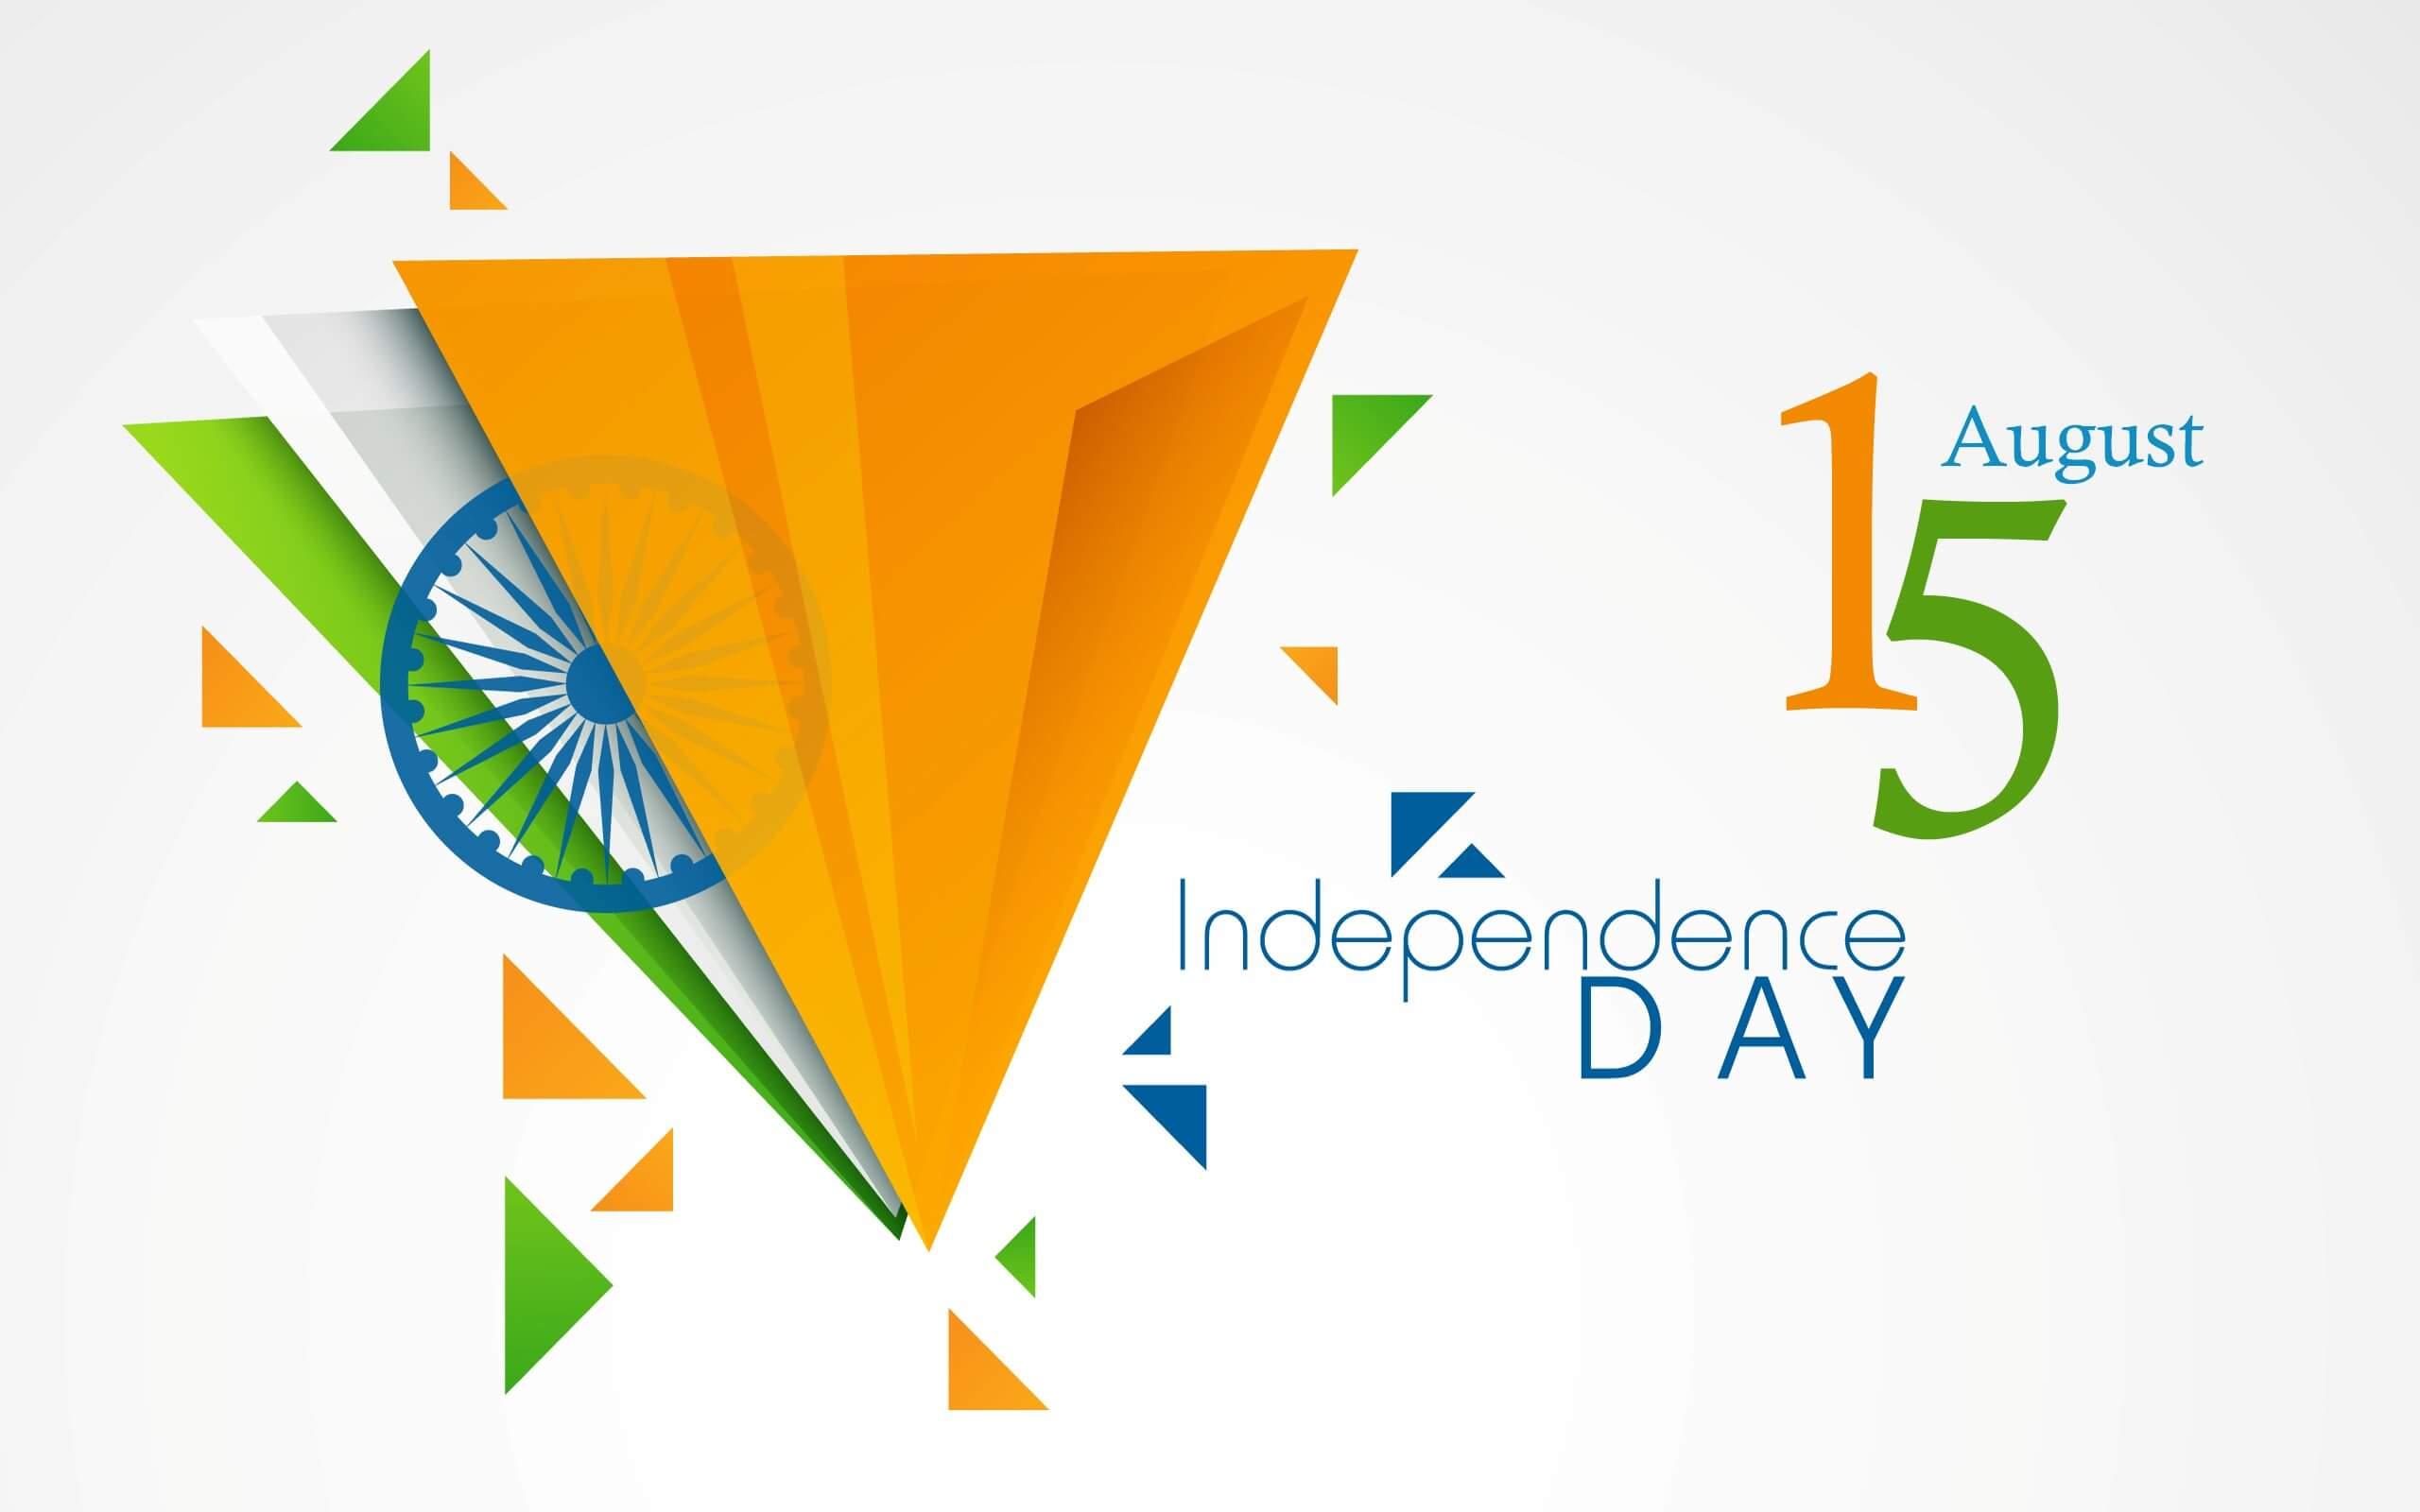 31 patriotic wallpapers greetings independence day 2018 image india independence day wallpapers m4hsunfo